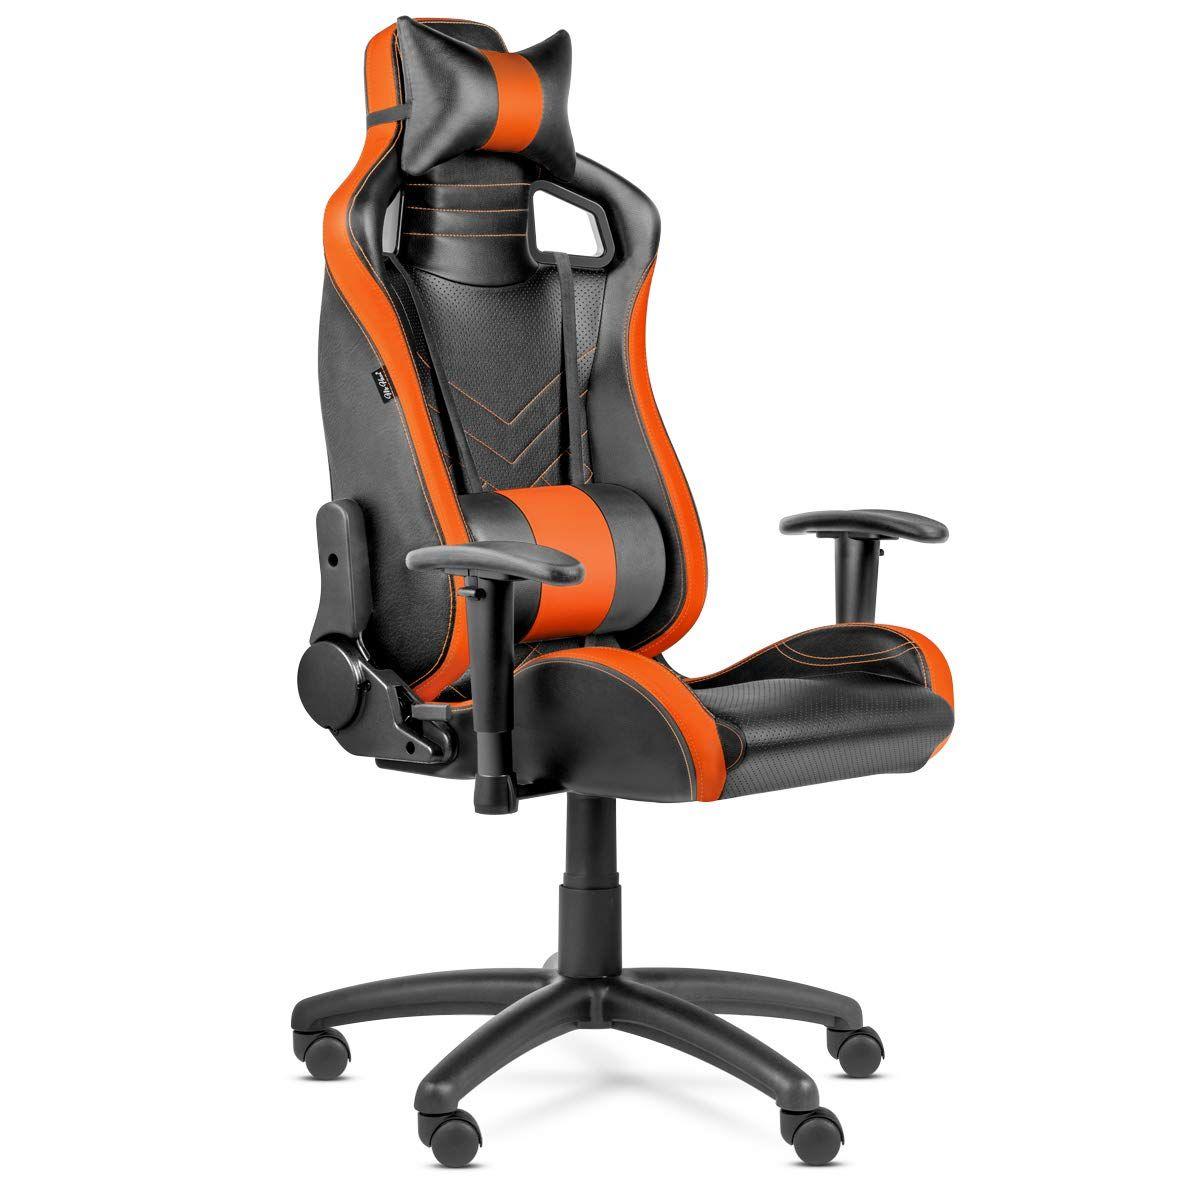 Mchaus Gaming Pro Naranja M Sillas De Oficina Sillas Despacho Reclinable